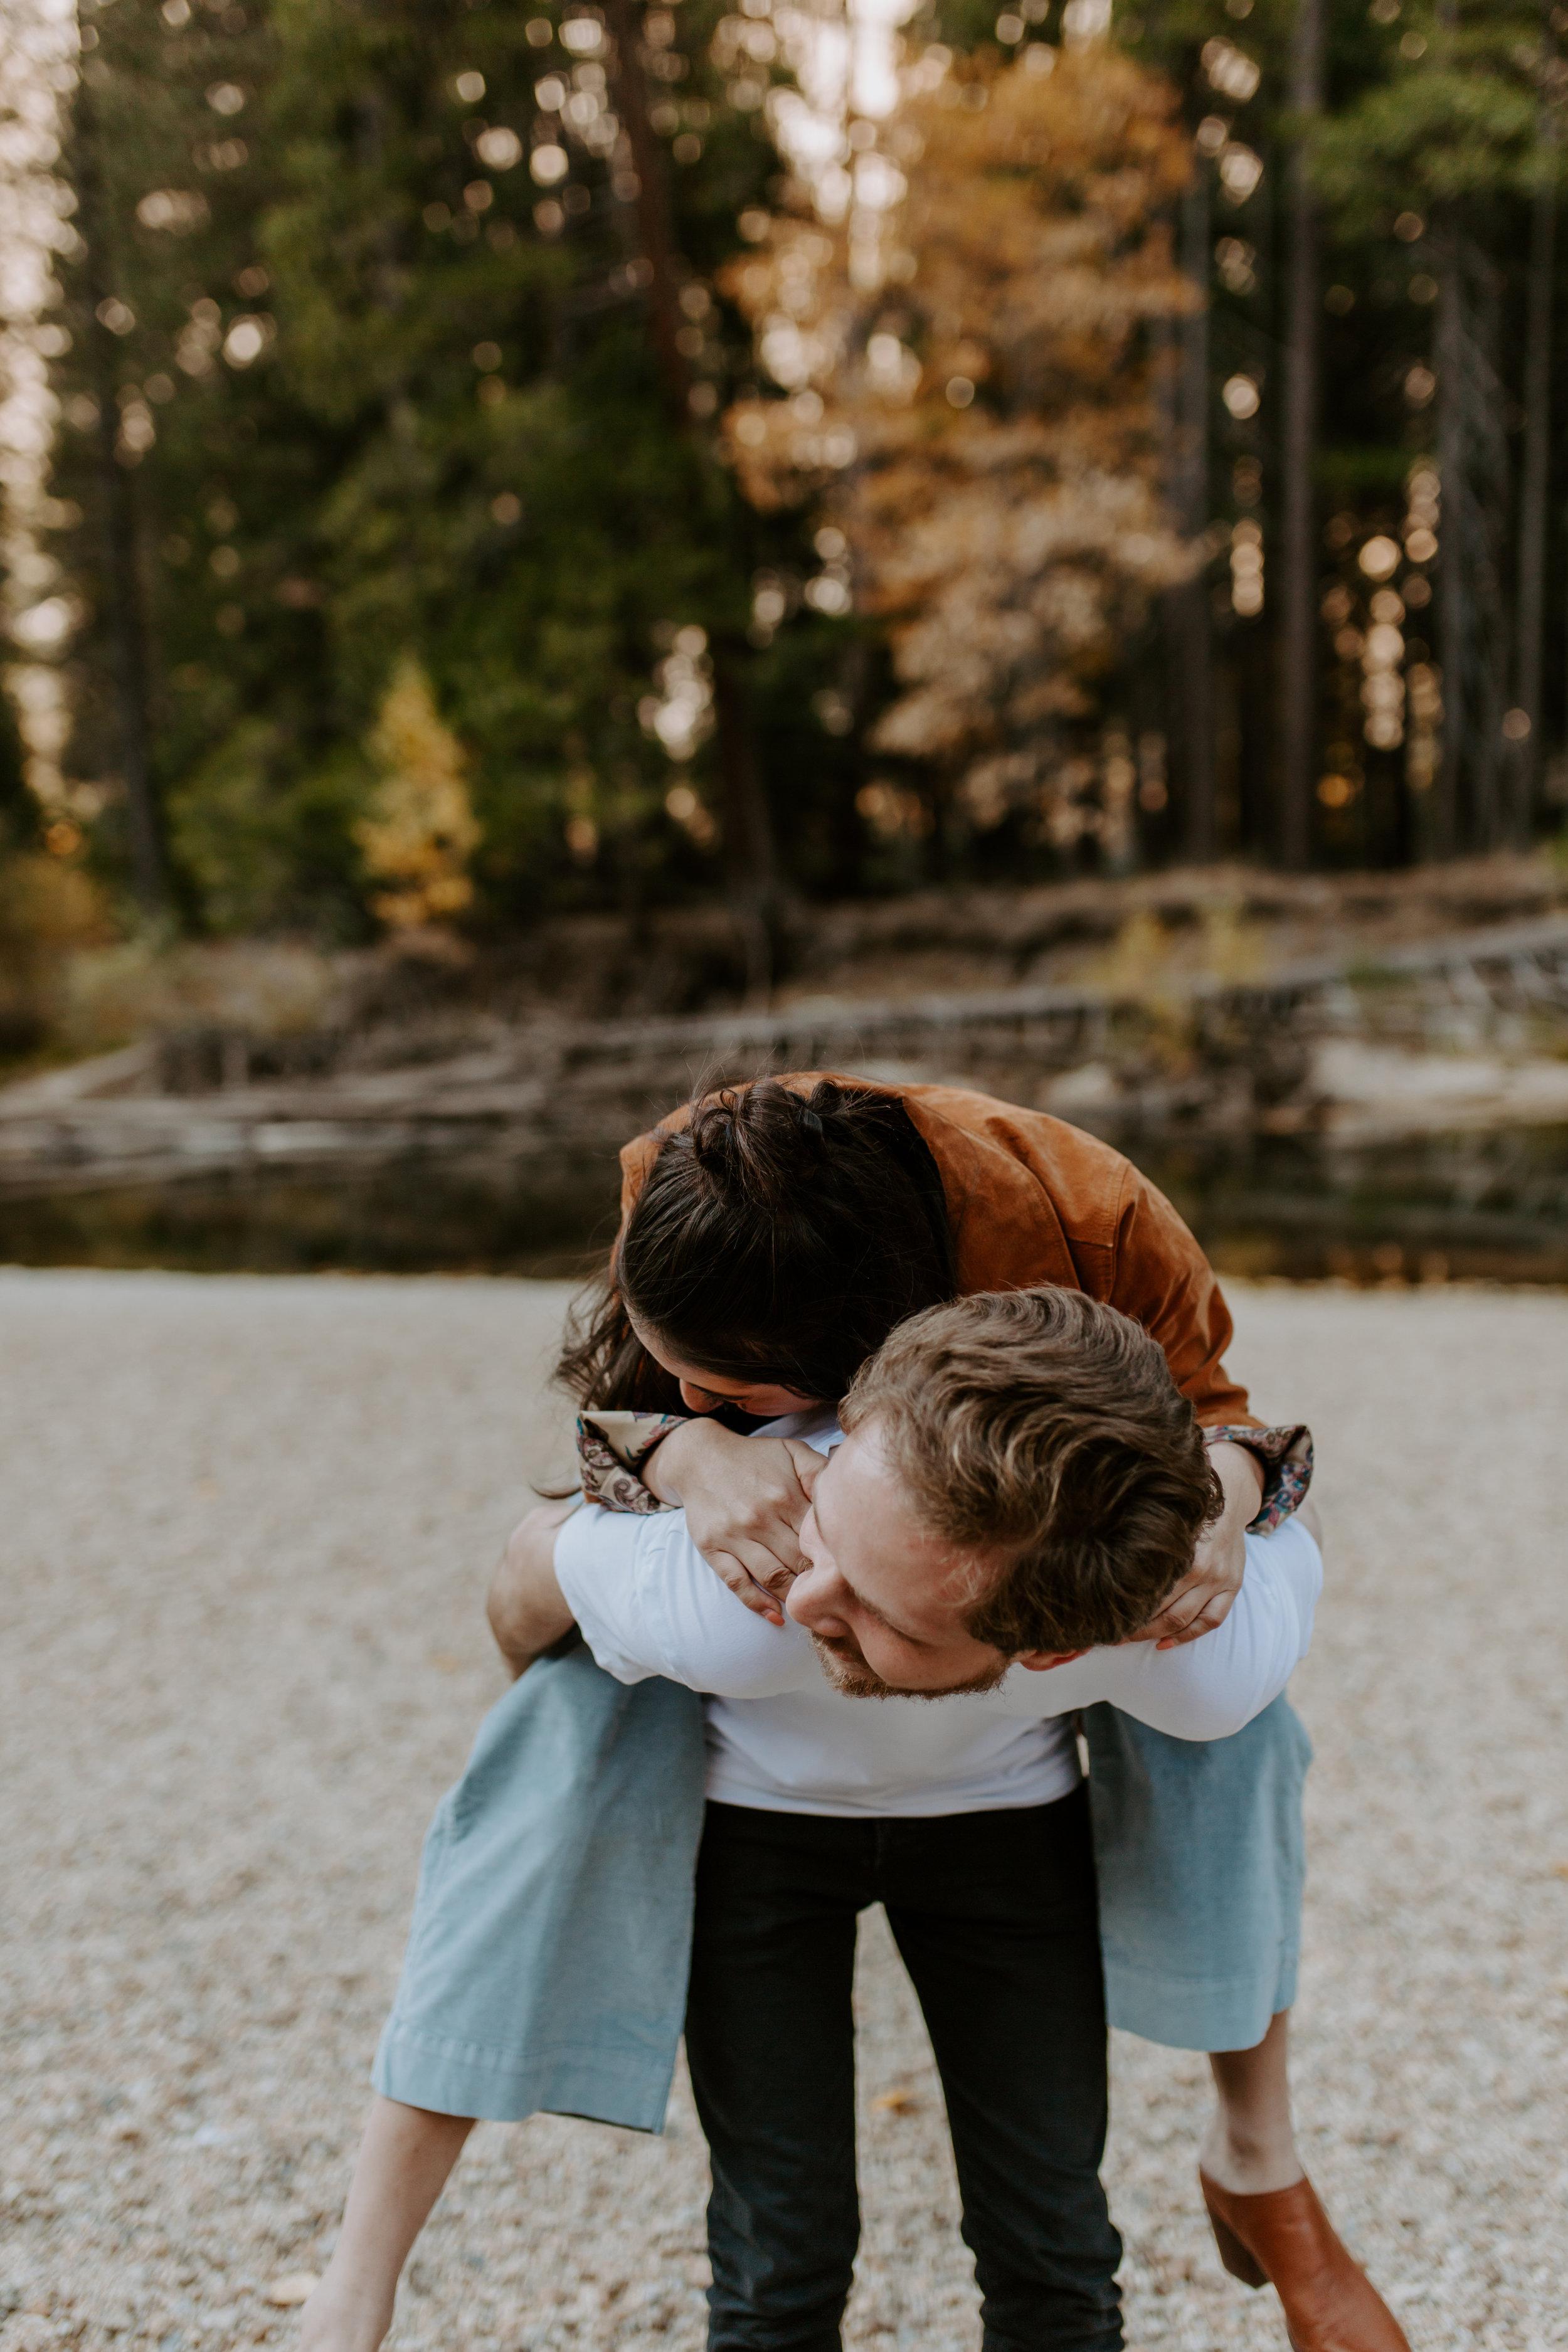 yosemite_valley_couple_session_october_28_2018_maia_chloe_photo_sabrina_and_oleg